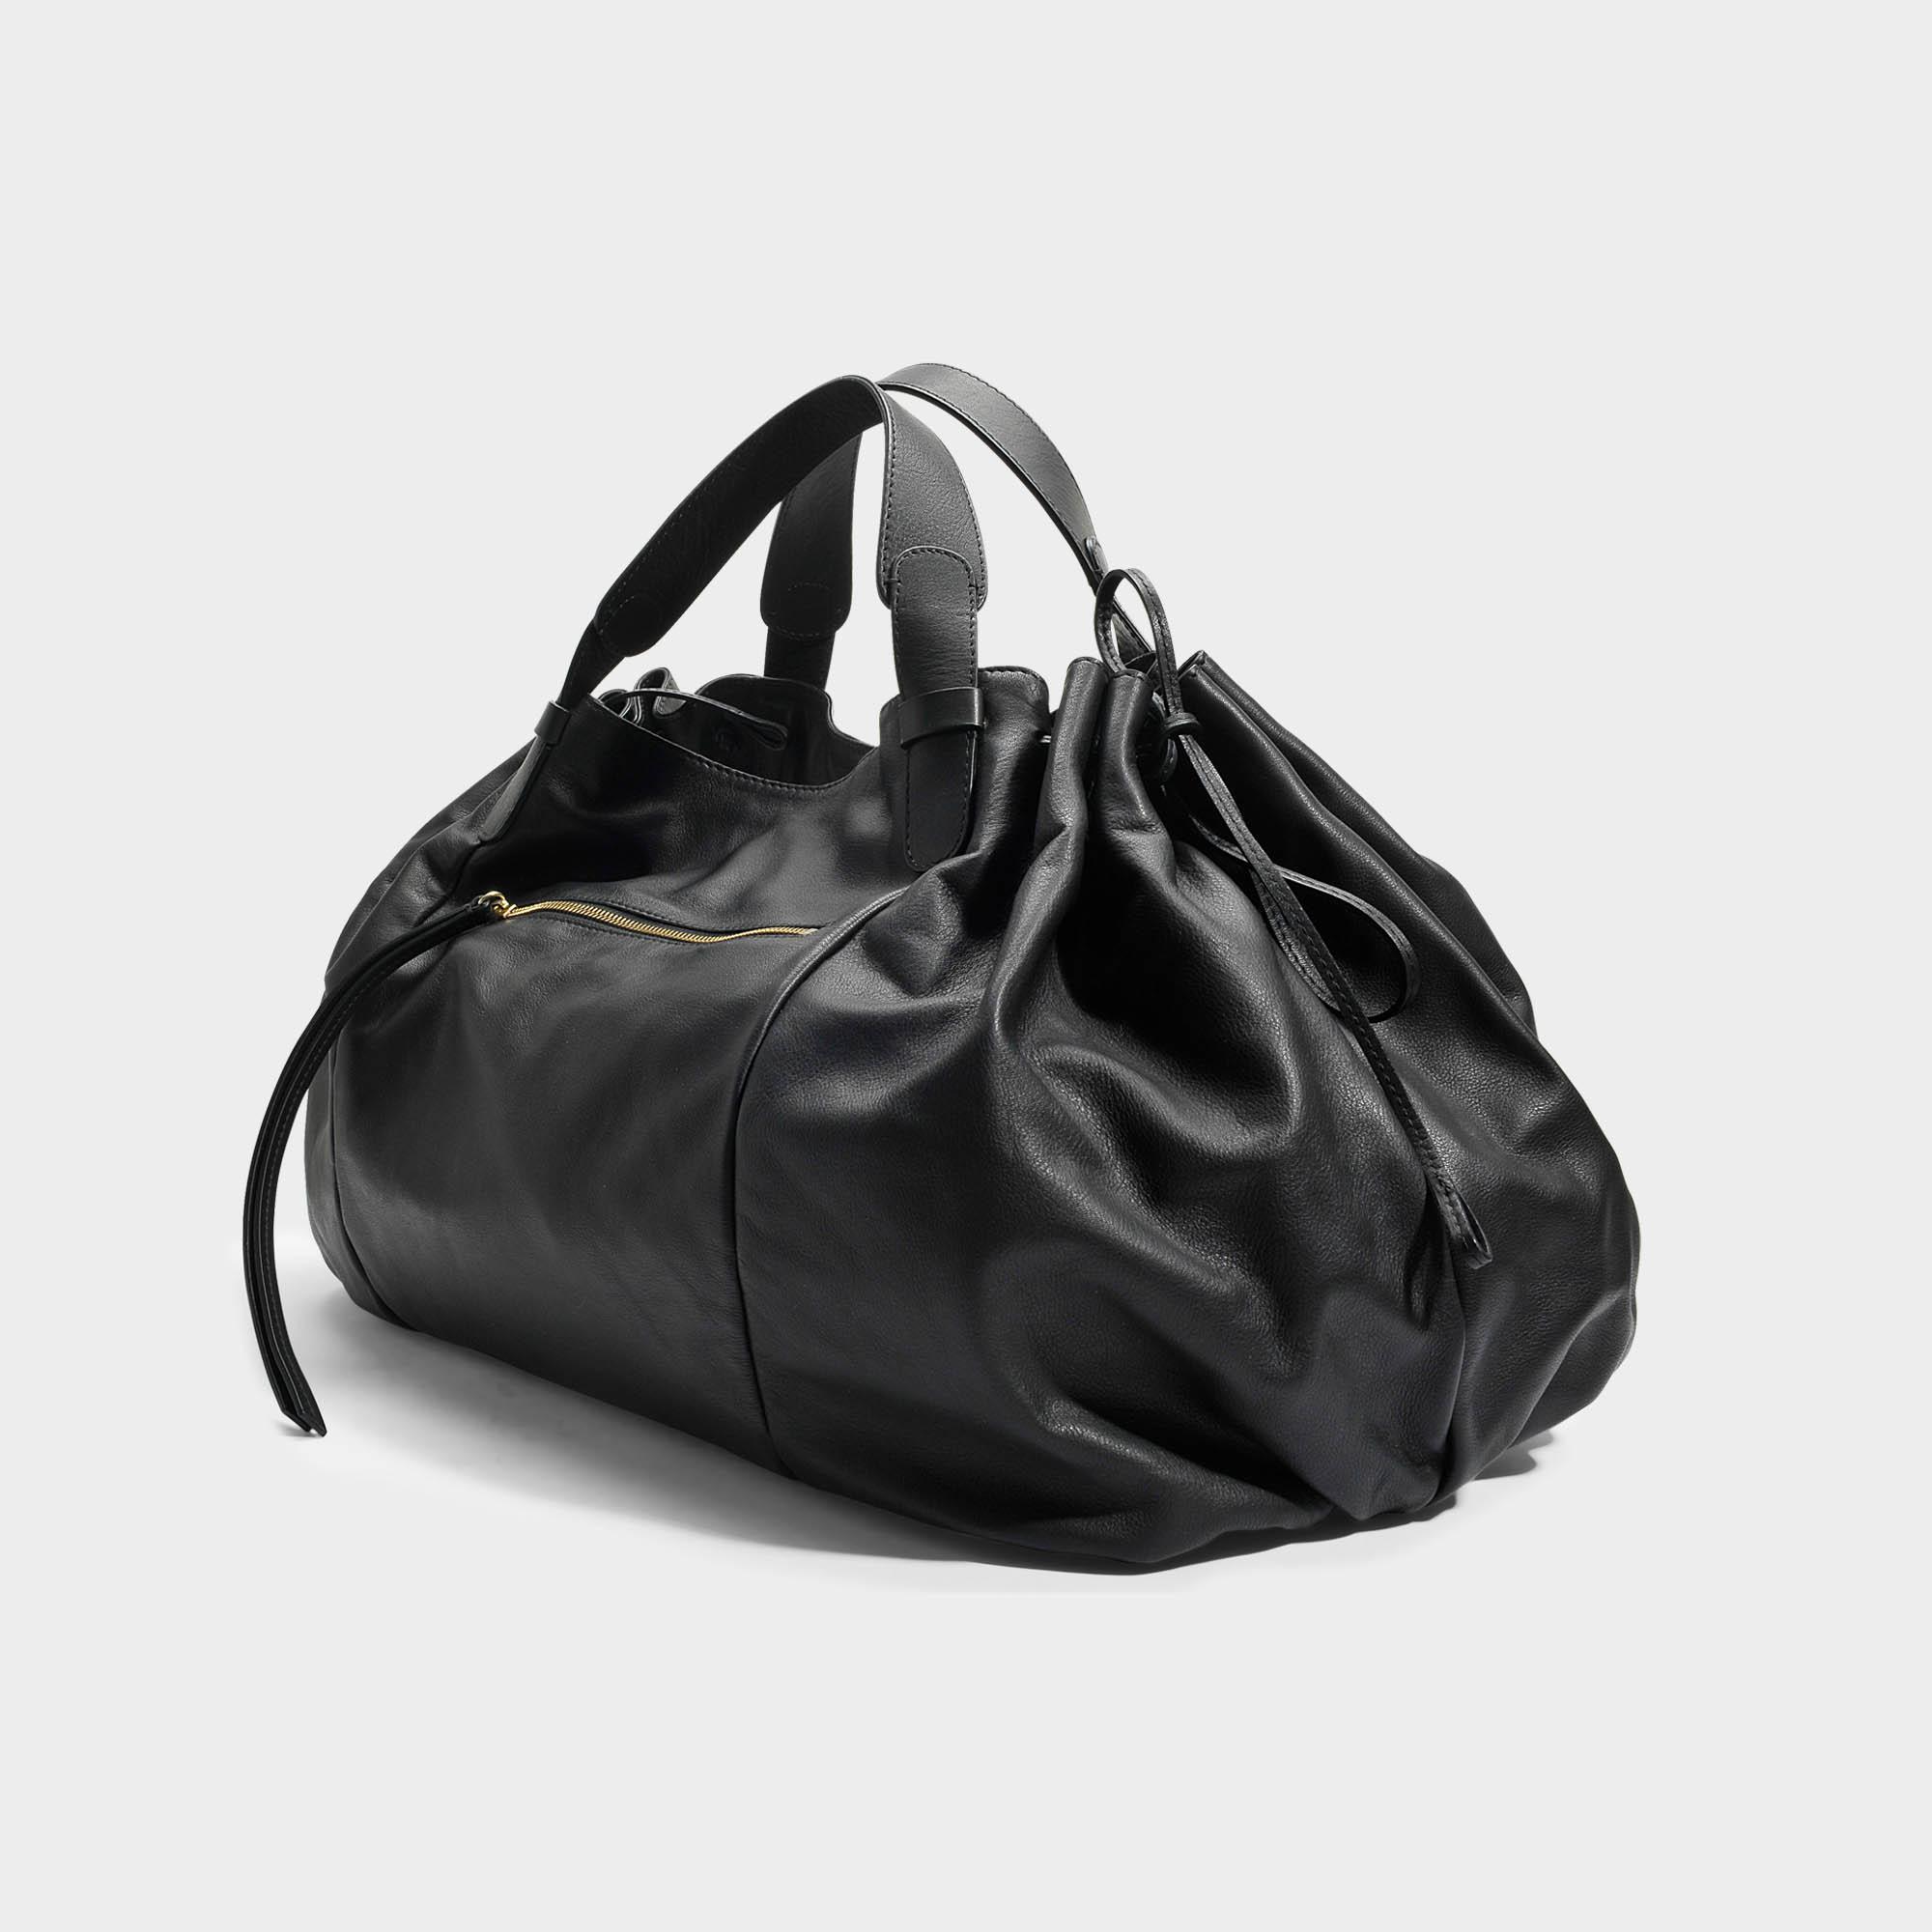 Maxi GD Bag in Black Calfskin Gerard Darel DlIuzE9cPn